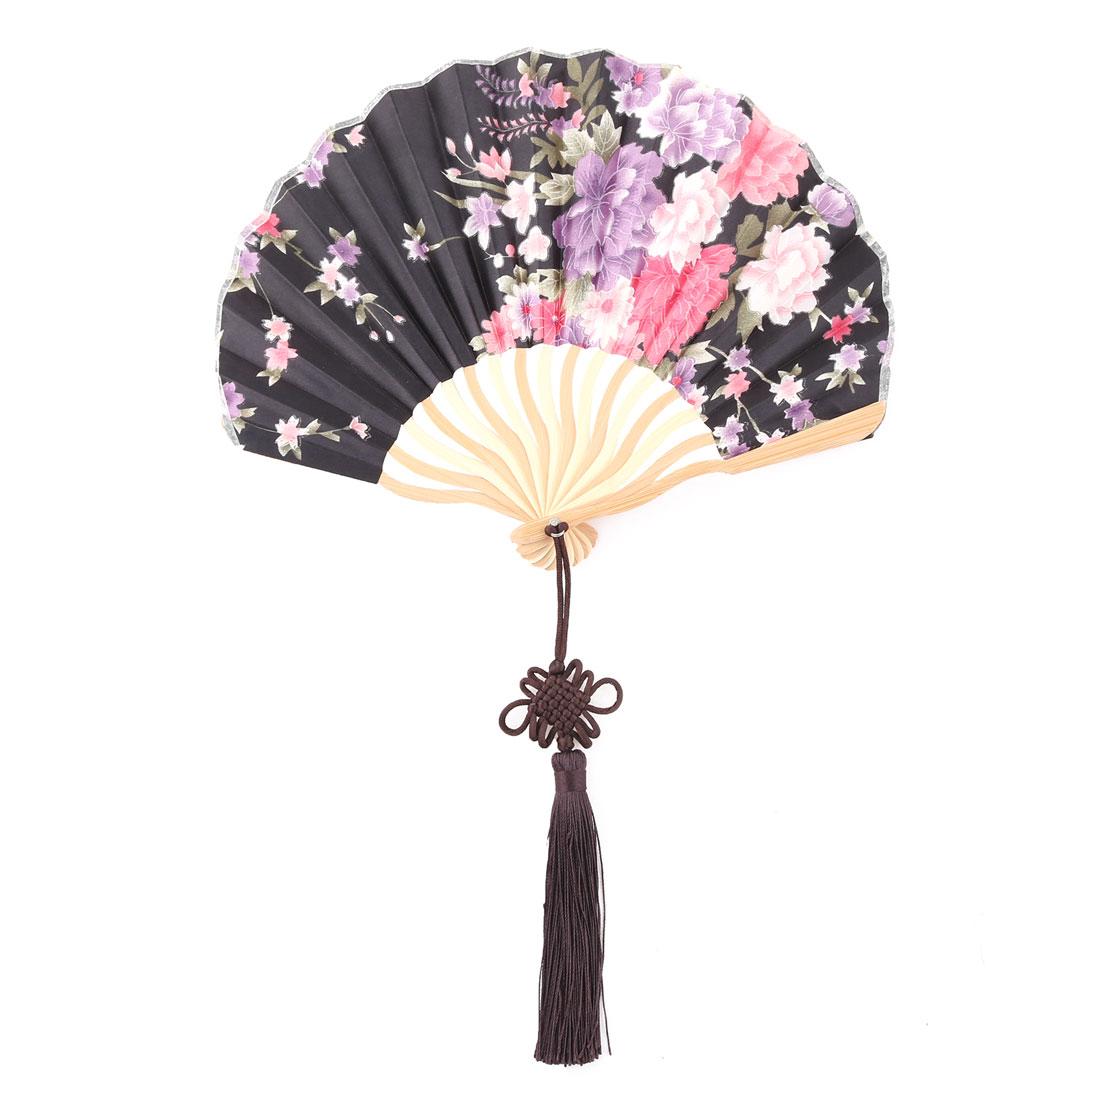 Bamboo Frame Chinese Knot Tassel Pendant Decor Dancing Folding Hand Fan Black